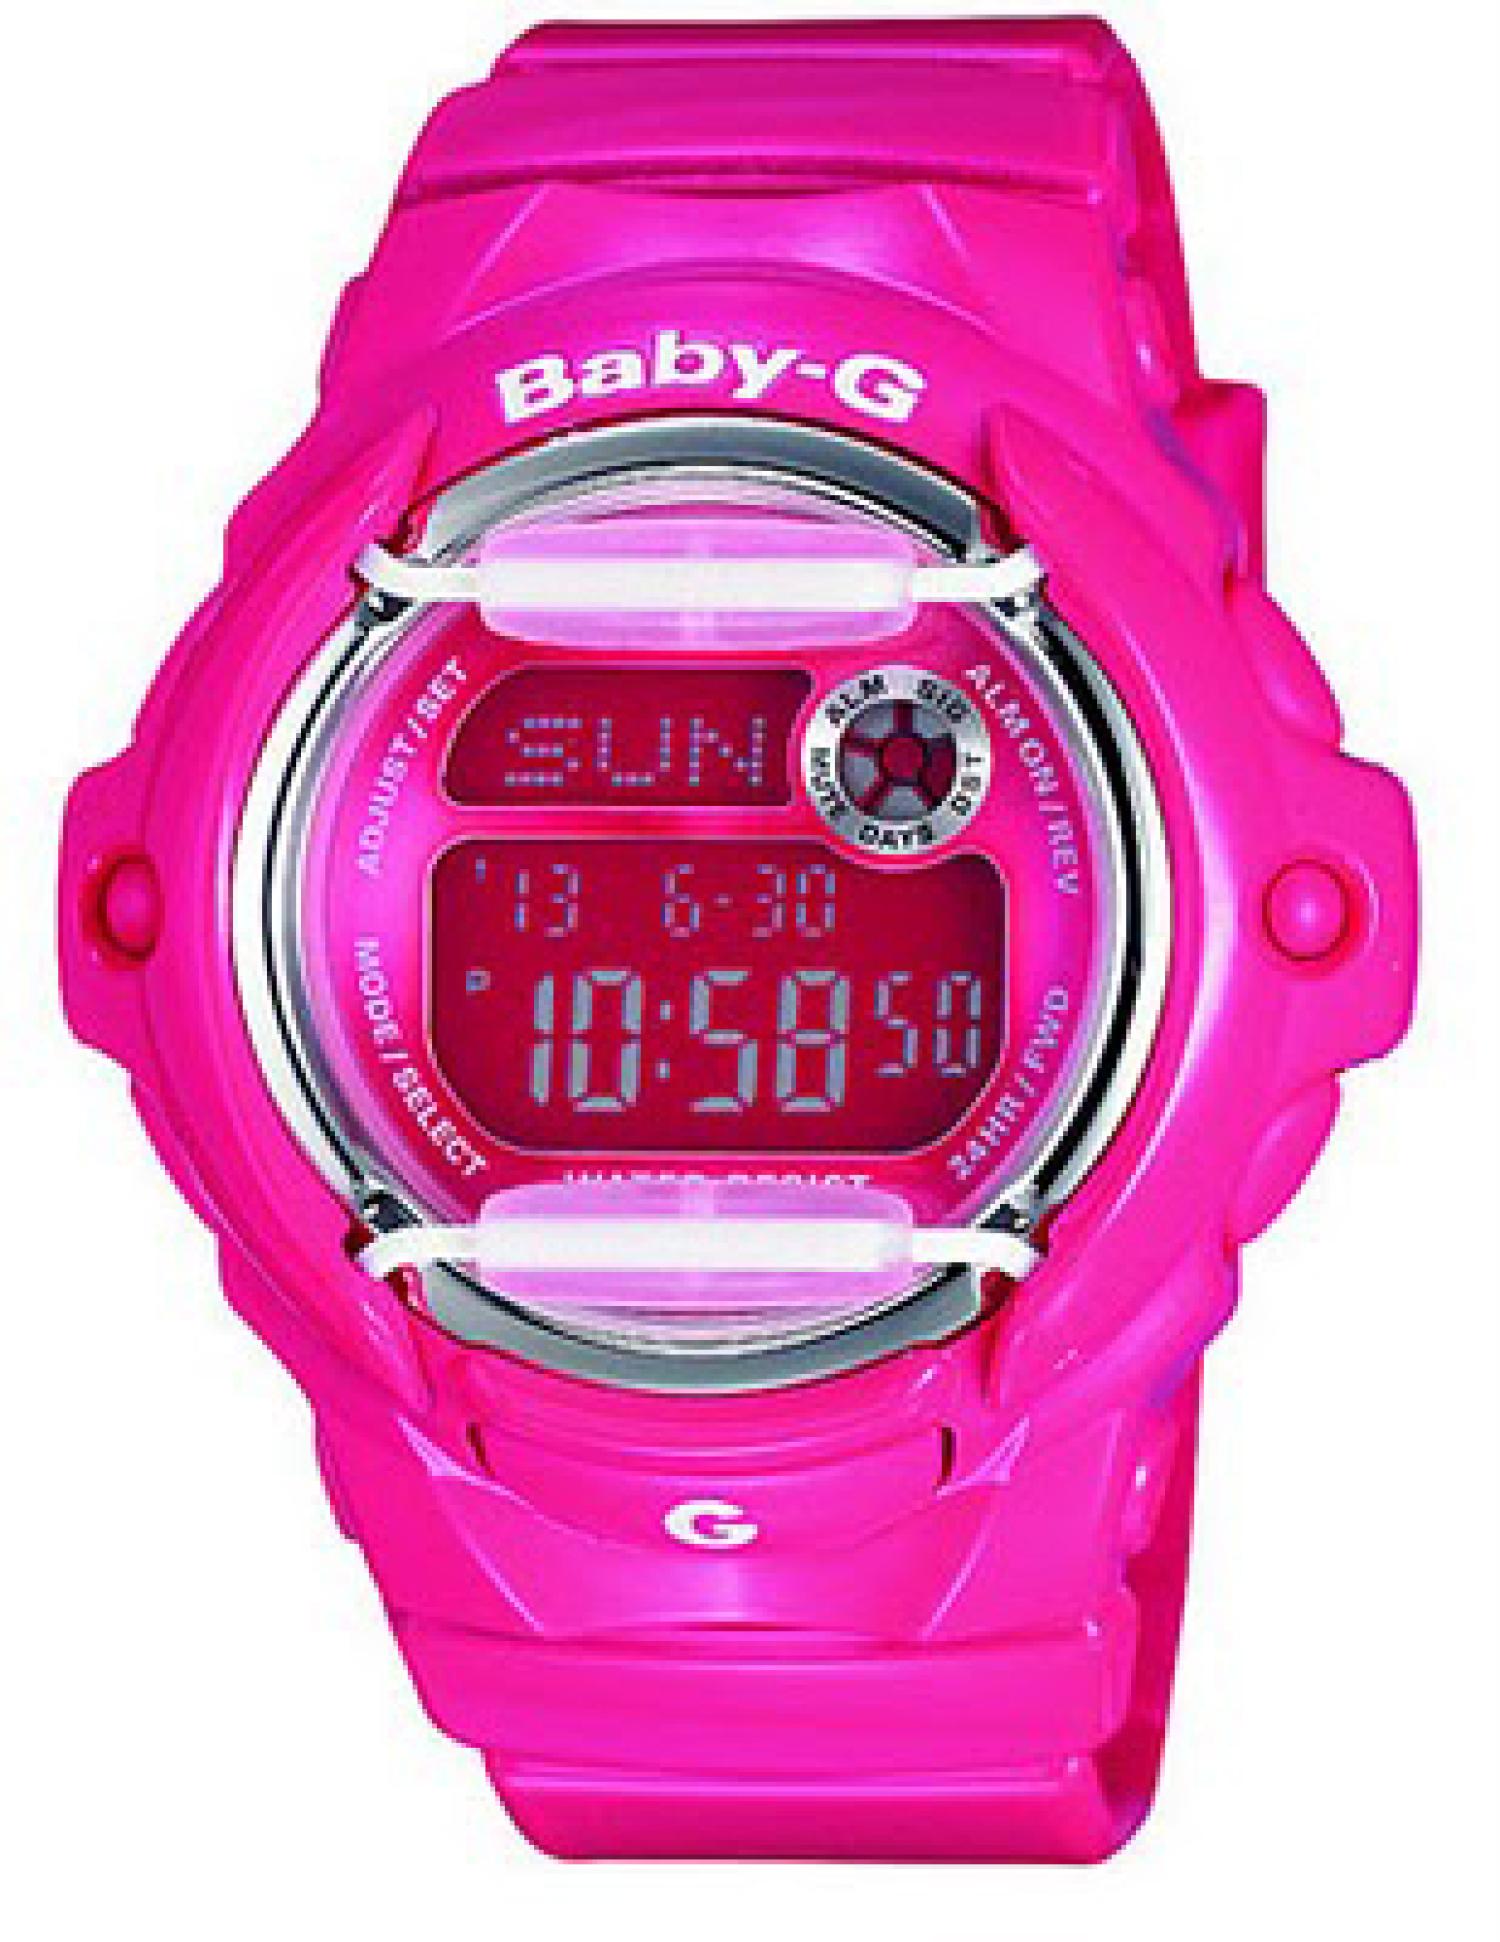 Casio_Womens_BG169R4B_Pink_Resin_Quartz_Sport_Watch